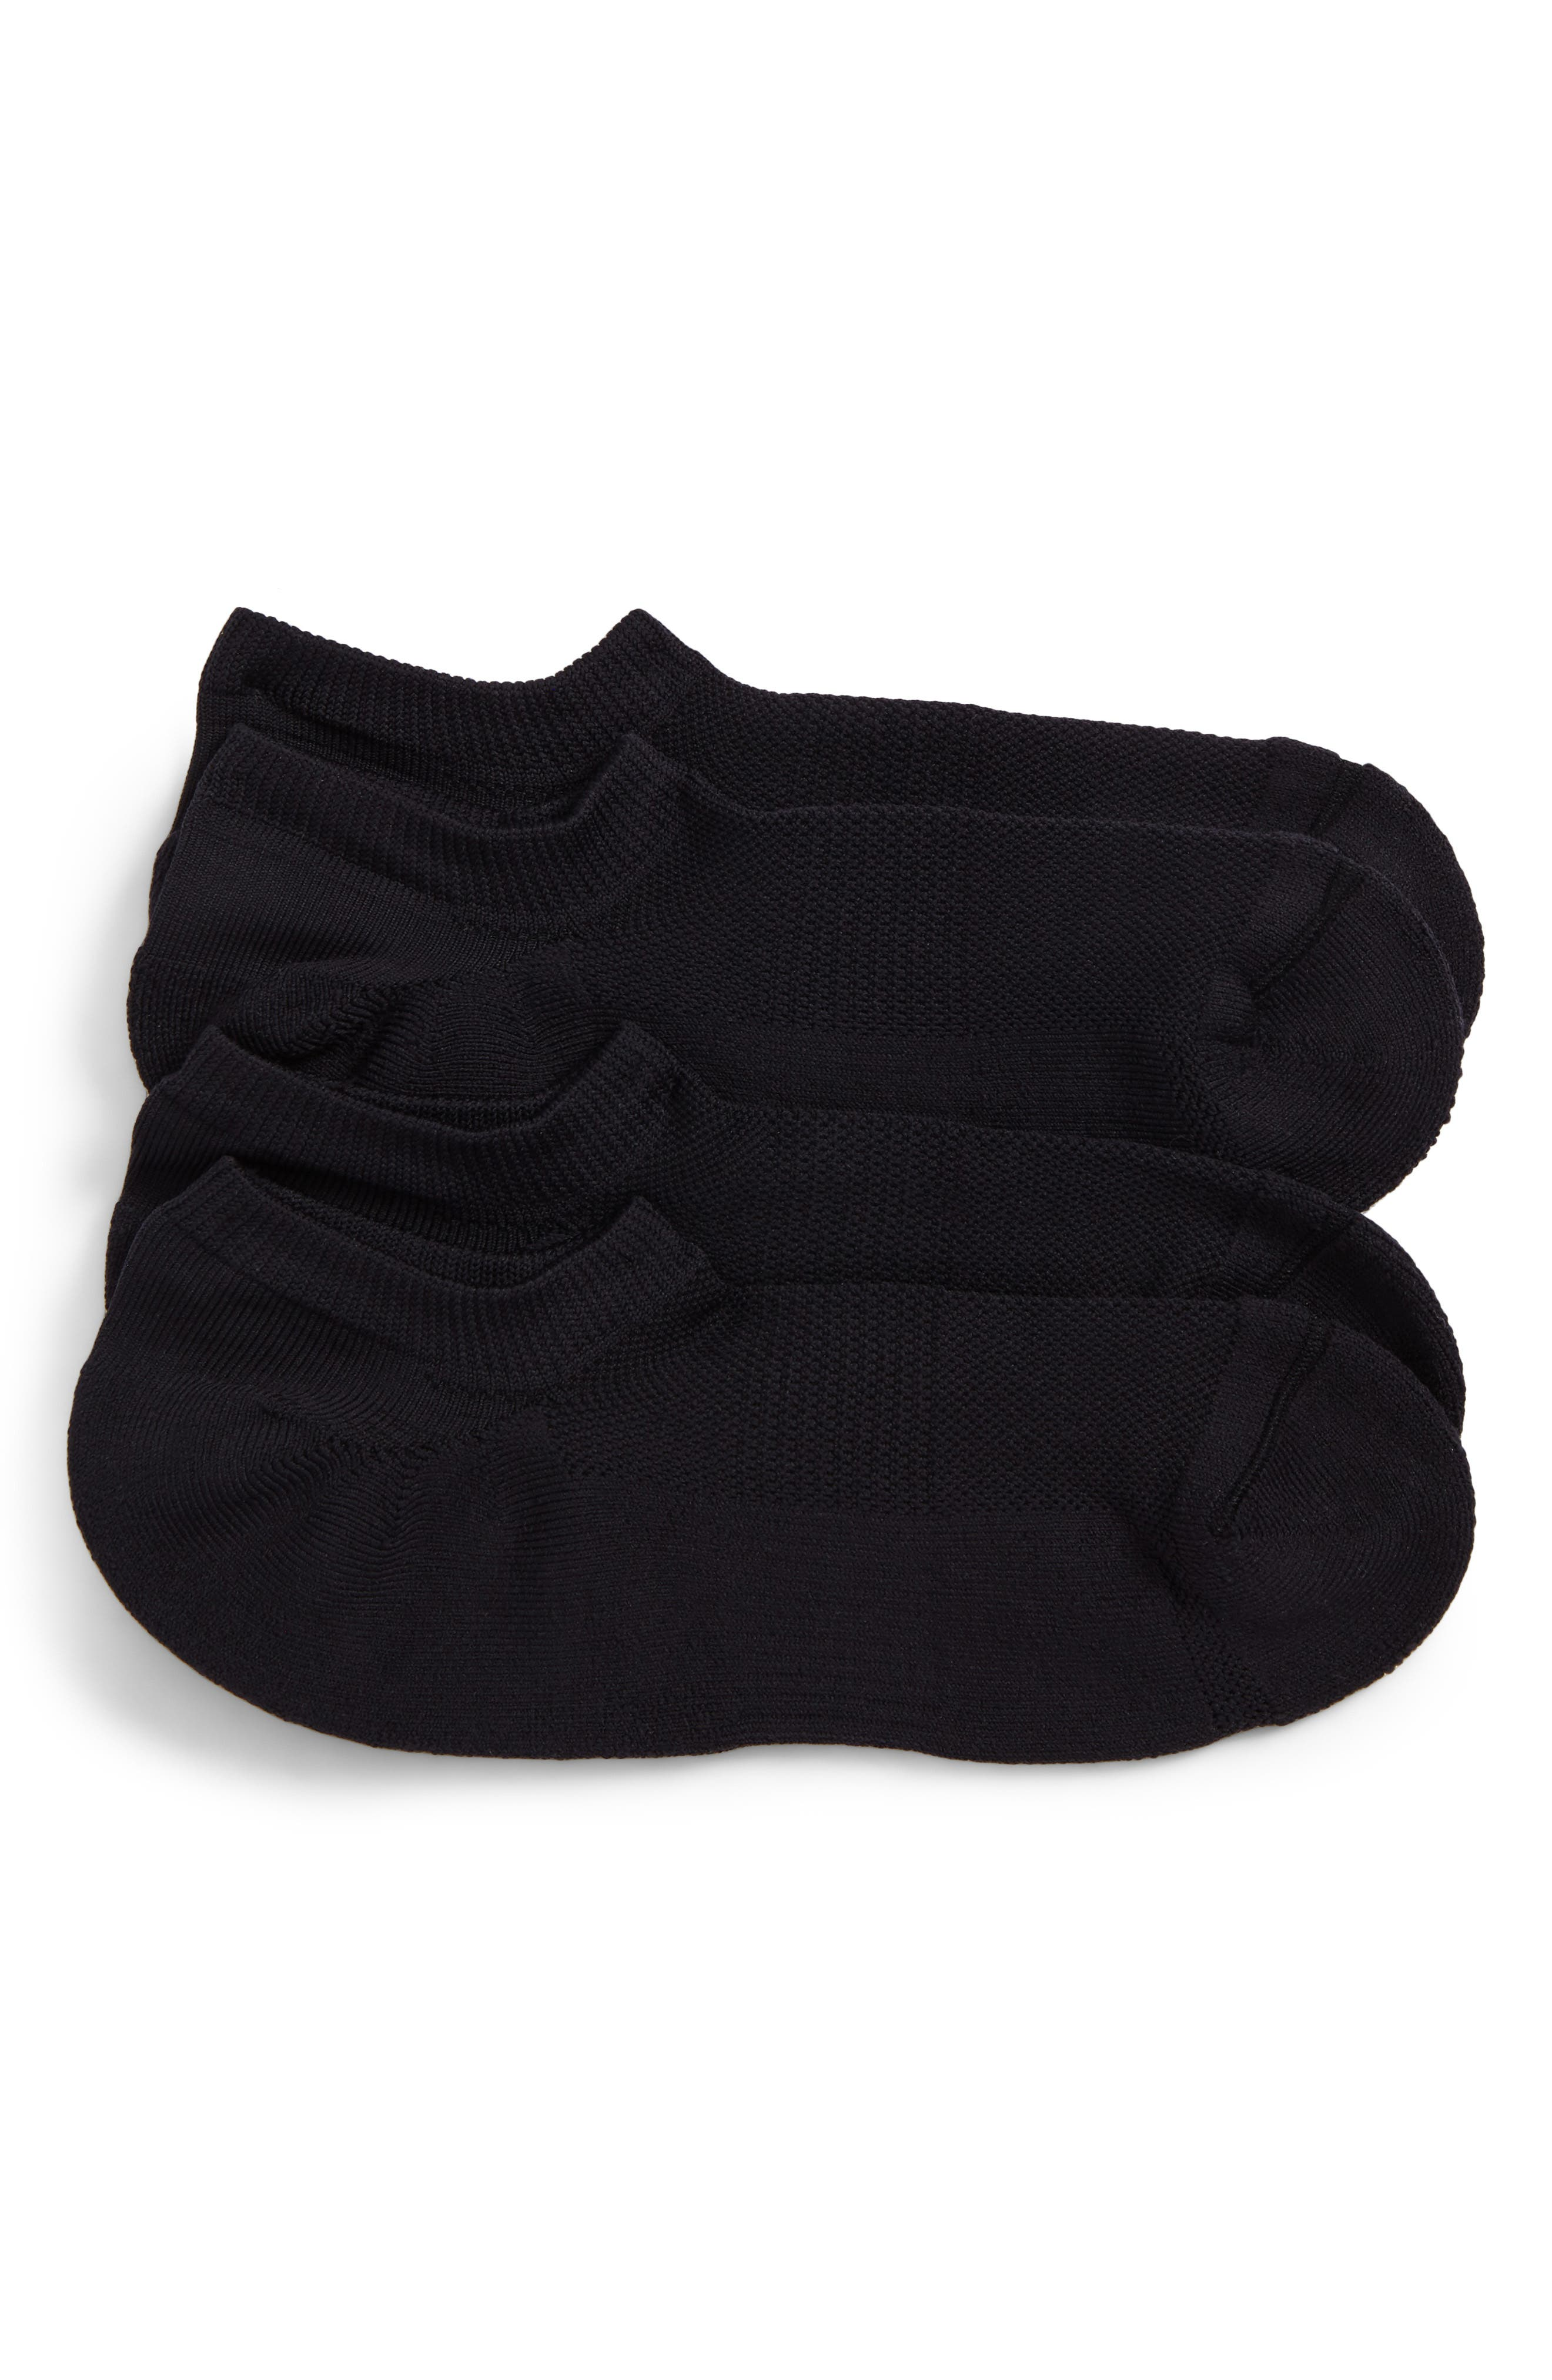 Tech-Smart 2-Pack No-Show Socks,                         Main,                         color, Black